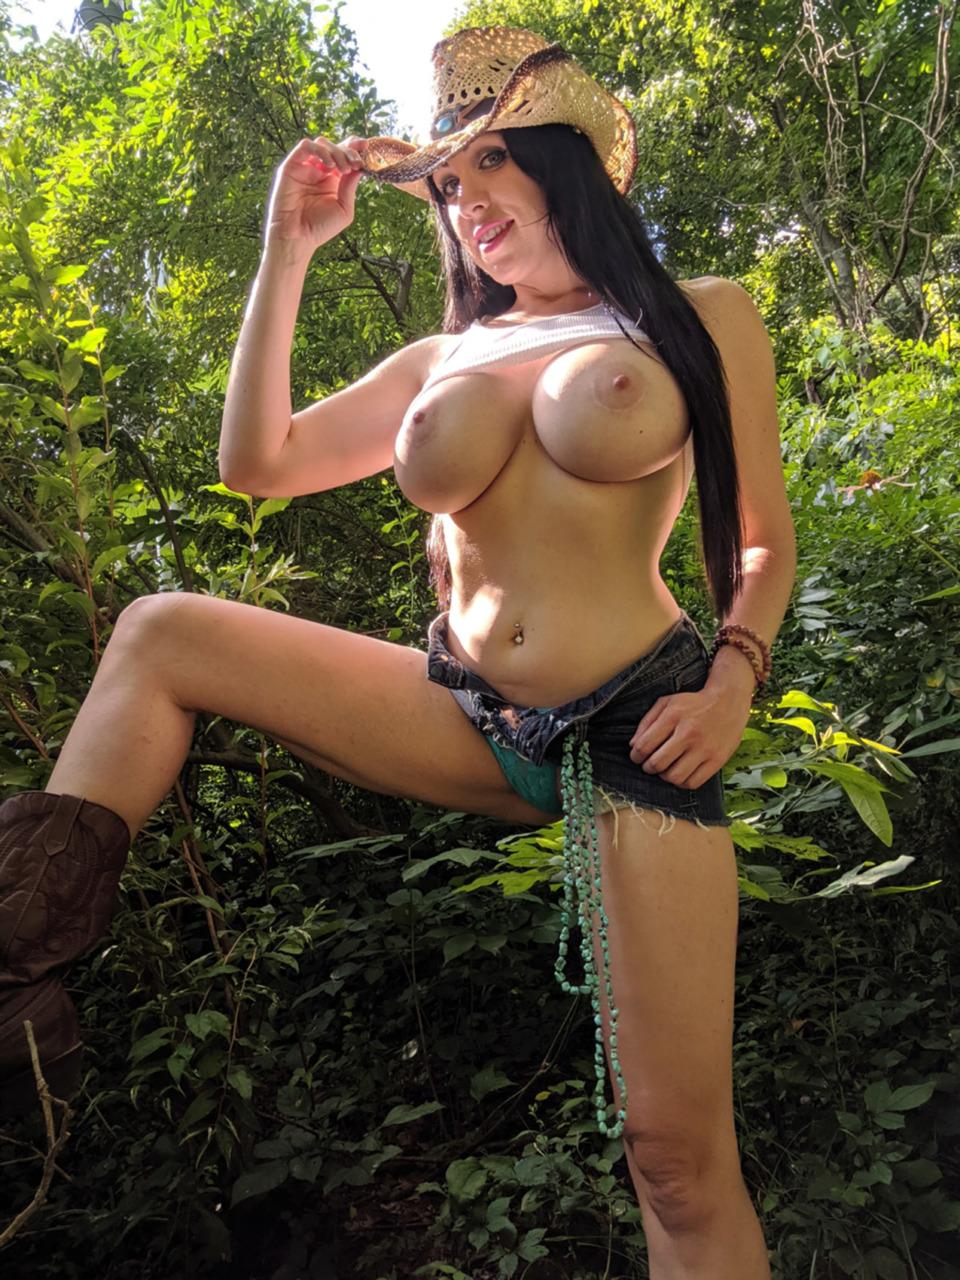 Kayla Kiss - The Busty Cowgirl 9